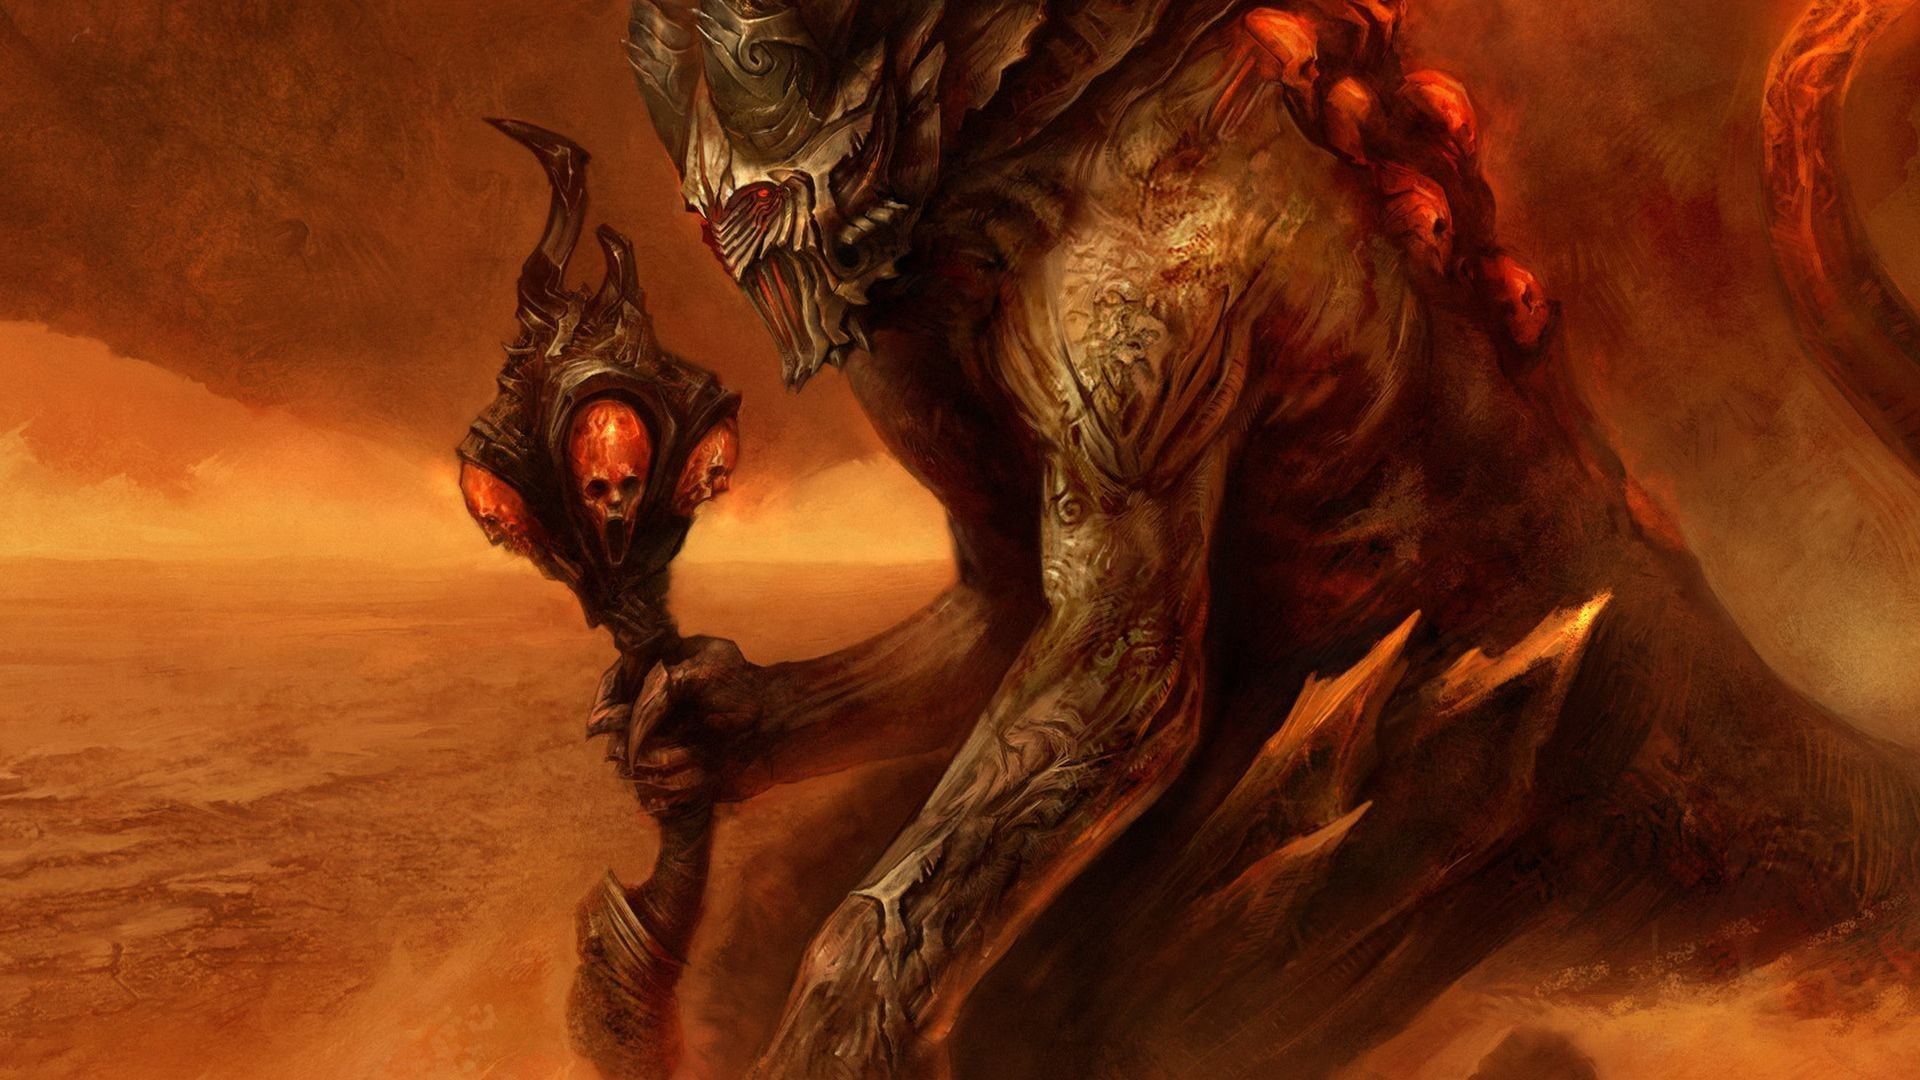 Hell Wallpaper hd Hell Beast x Wallpapers